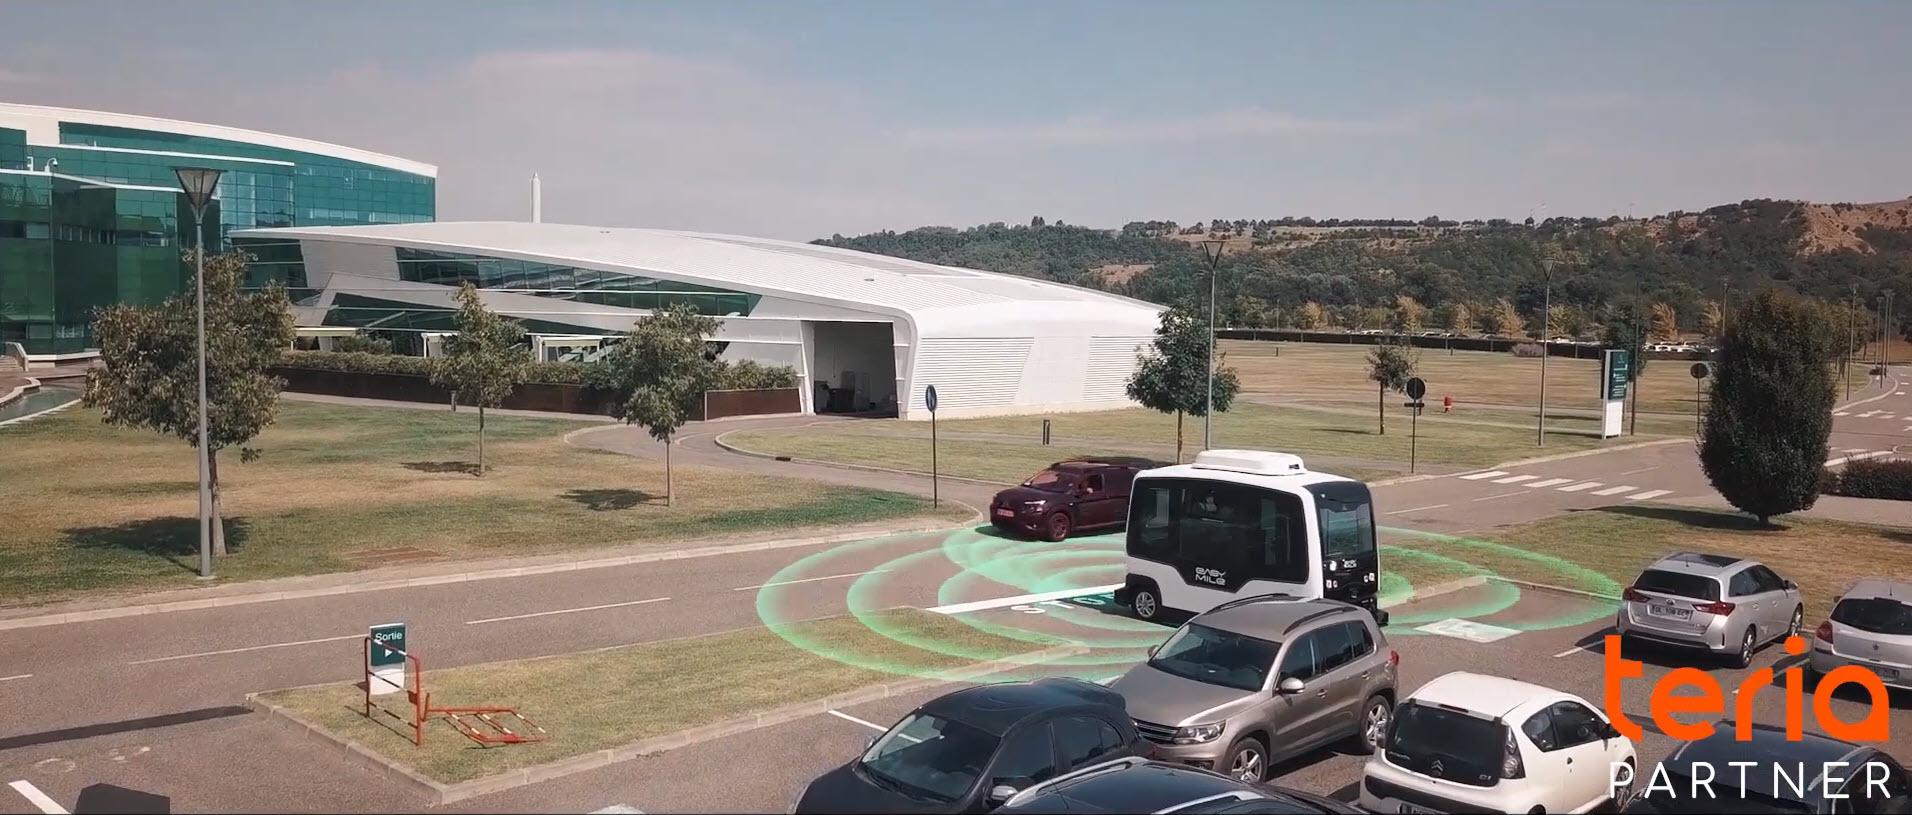 EASYMILE, pioneer in autonomous vehicles